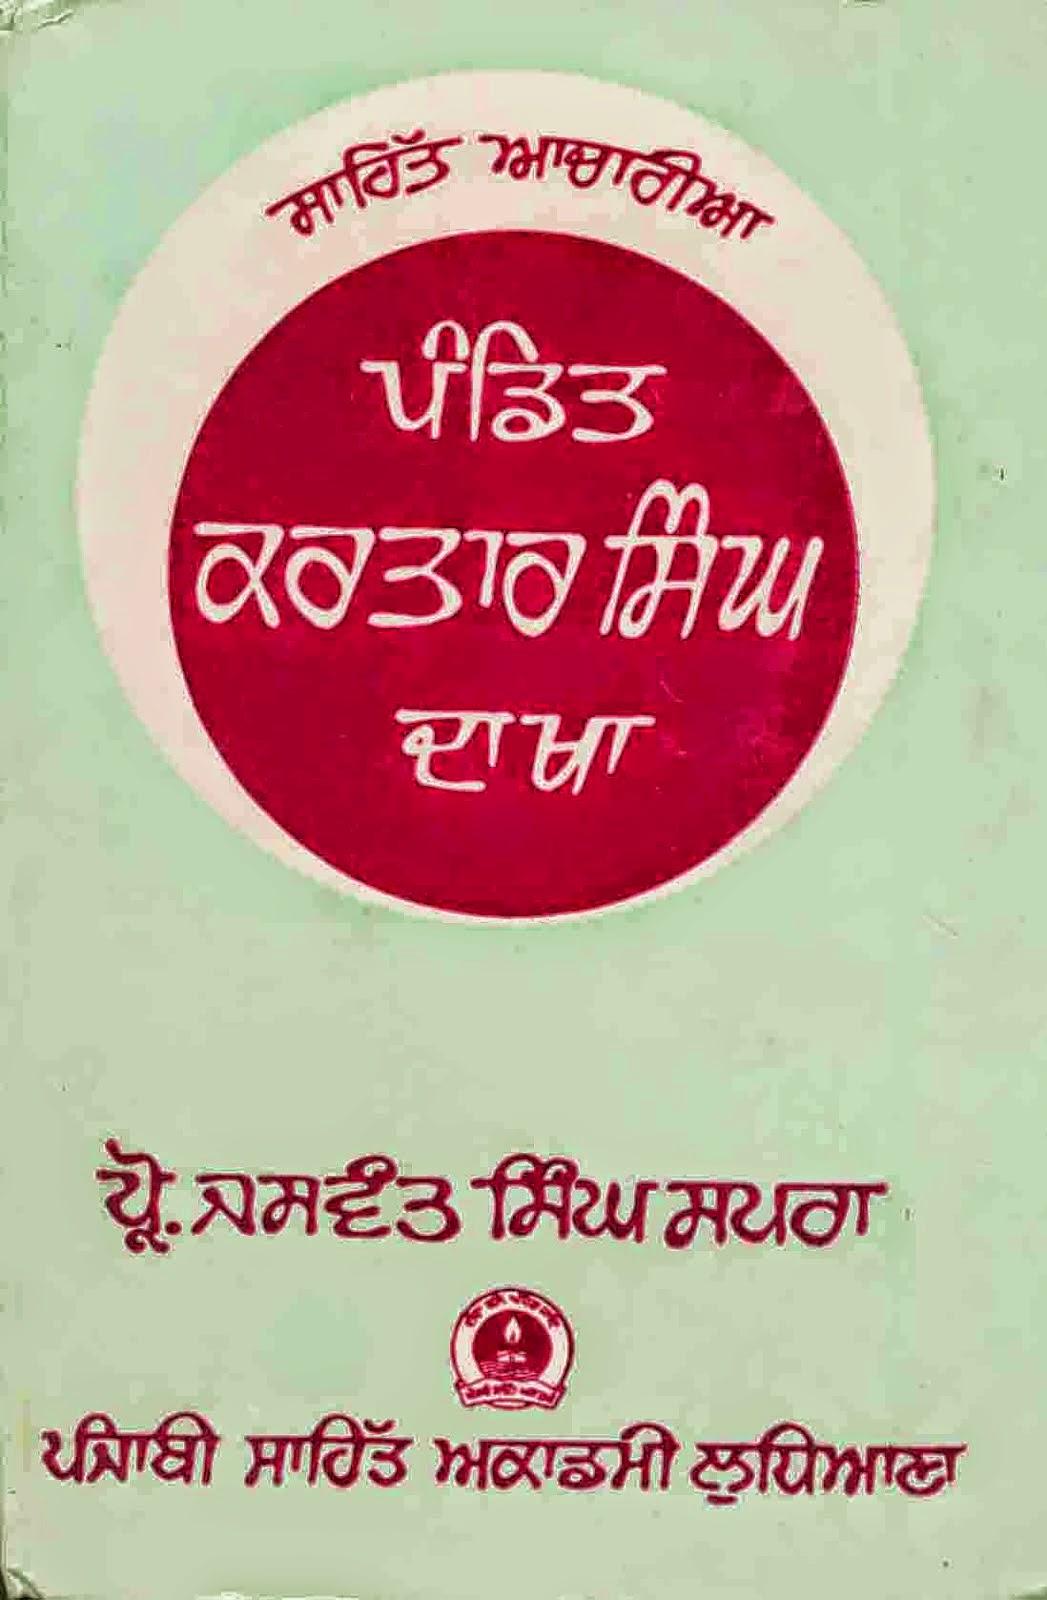 http://sikhdigitallibrary.blogspot.com/2016/01/sahitya-acharya-pandit-kartar-singh.html